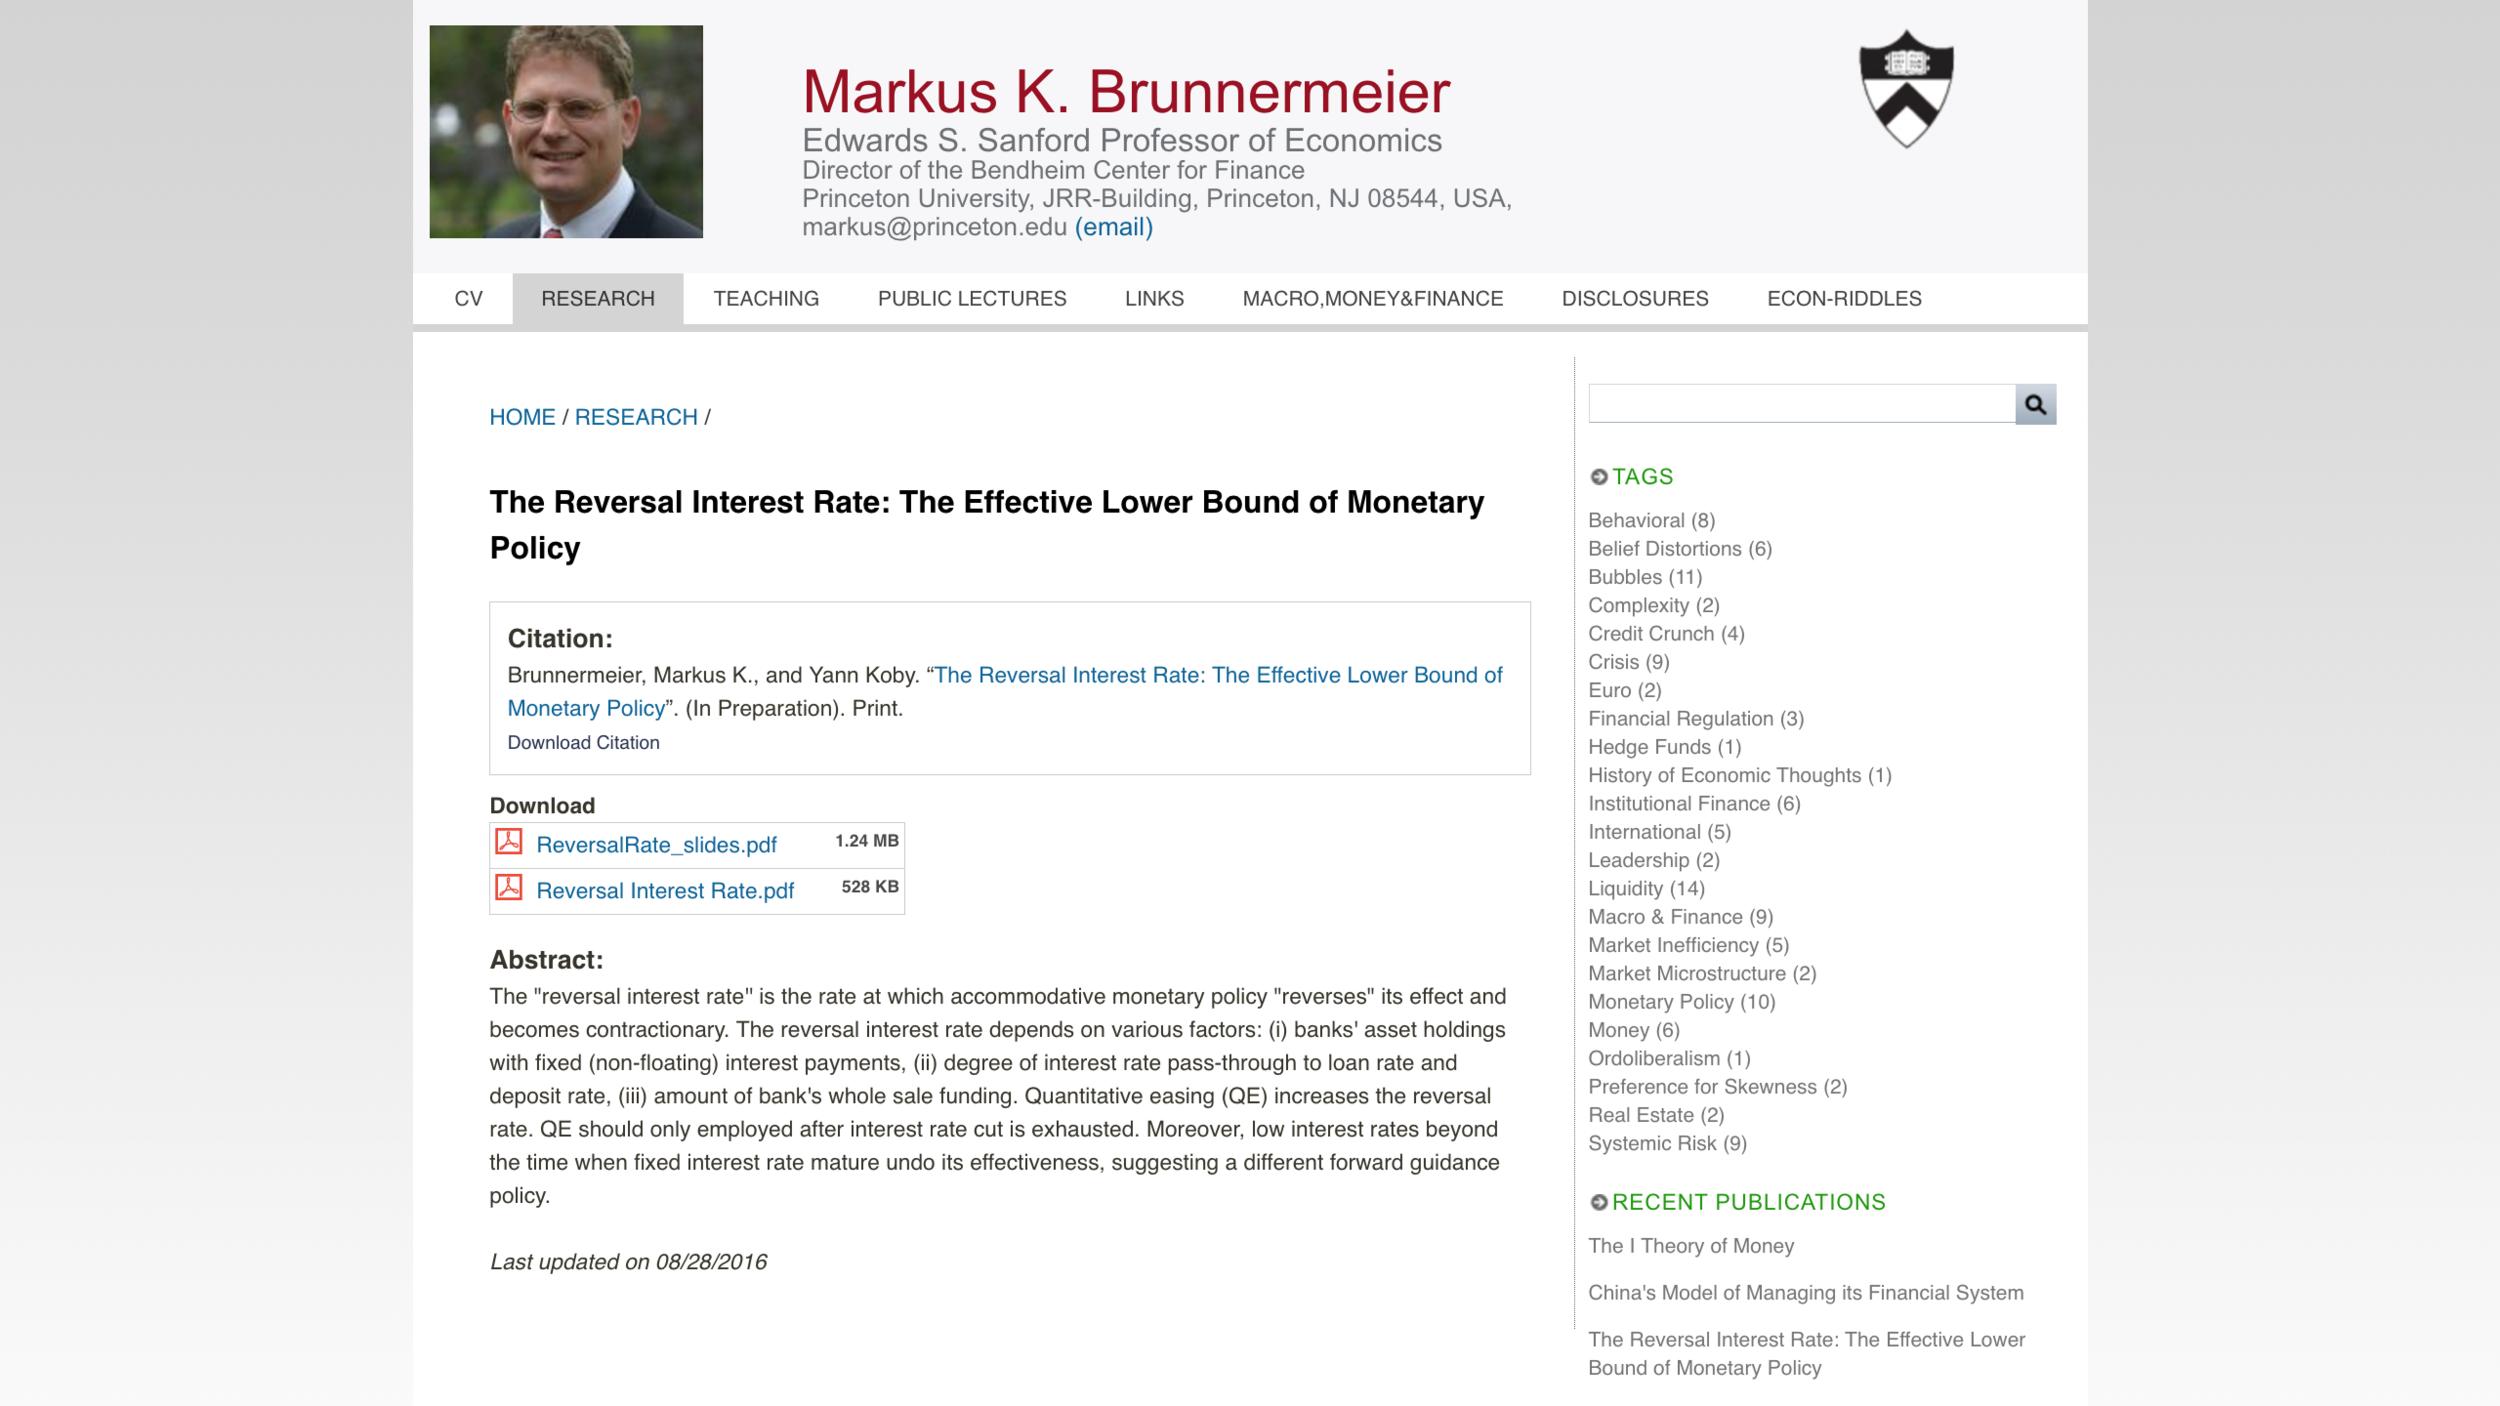 Link to Markus Brunnermeier's Princeton University webpage shown above